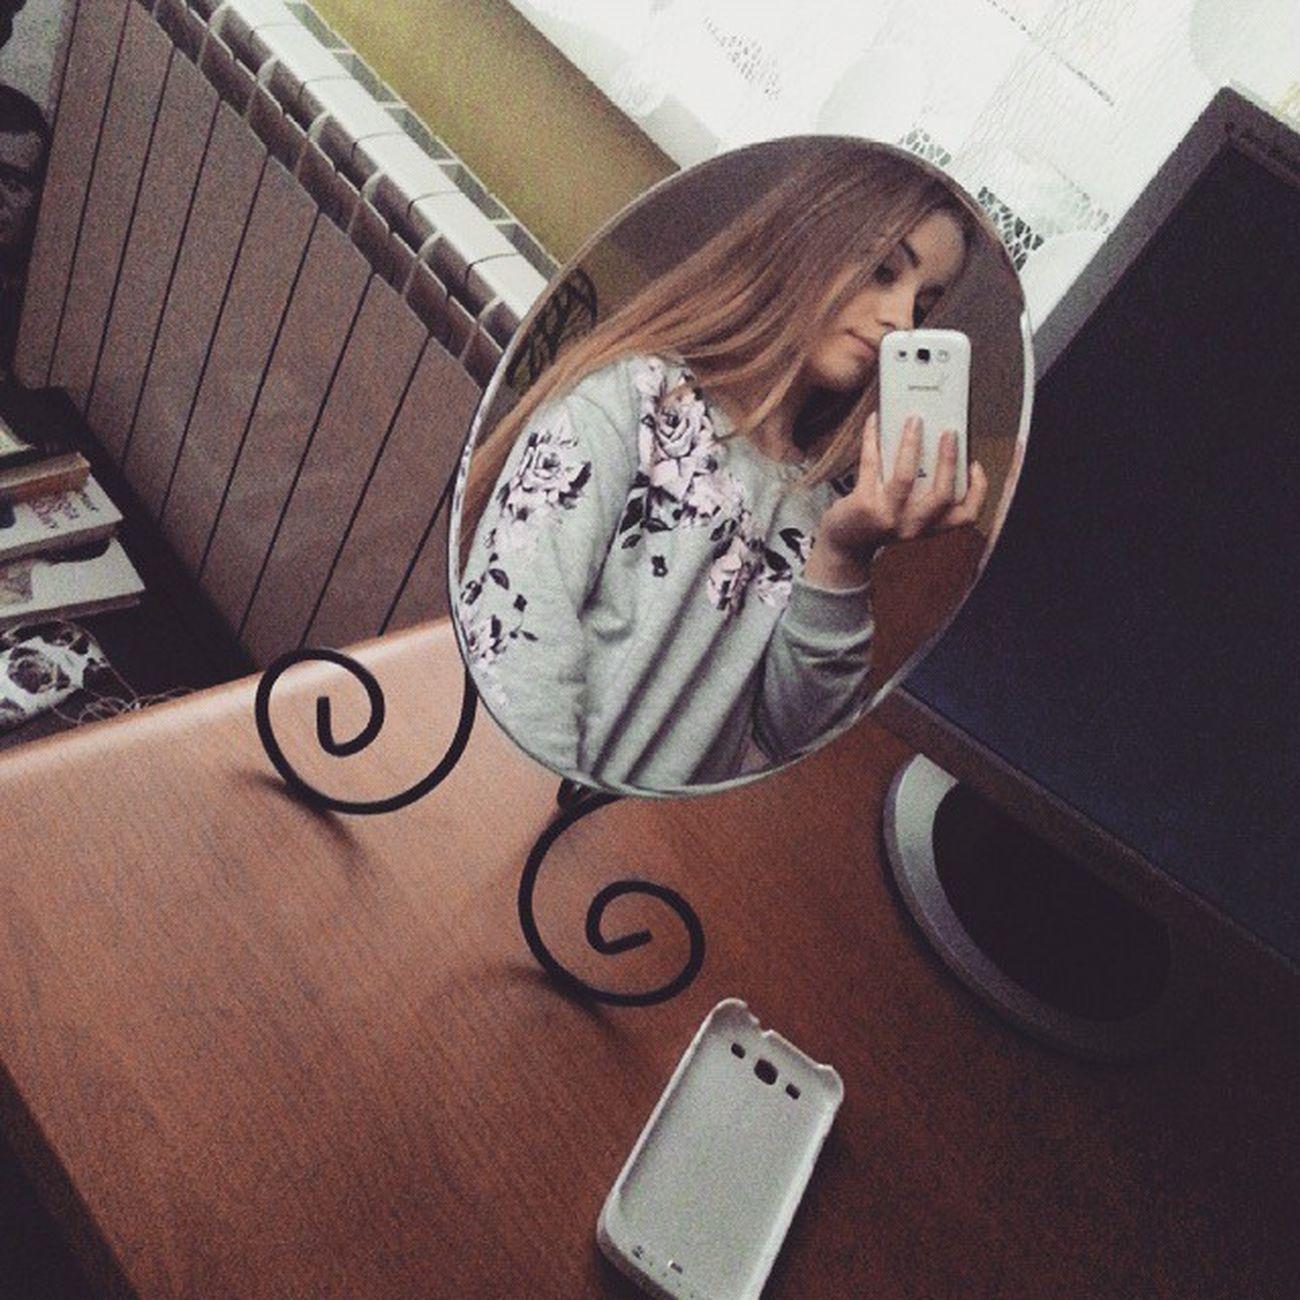 Helloeveryone Hieveryone Goodday Polishgirl mirror selfie instaselfie instaphoto roses tired tiredgirl ineedsleep iwantmoretime tagsforlikes teenager onlyoneday icanhandle byebye goodnight seeya 🙋